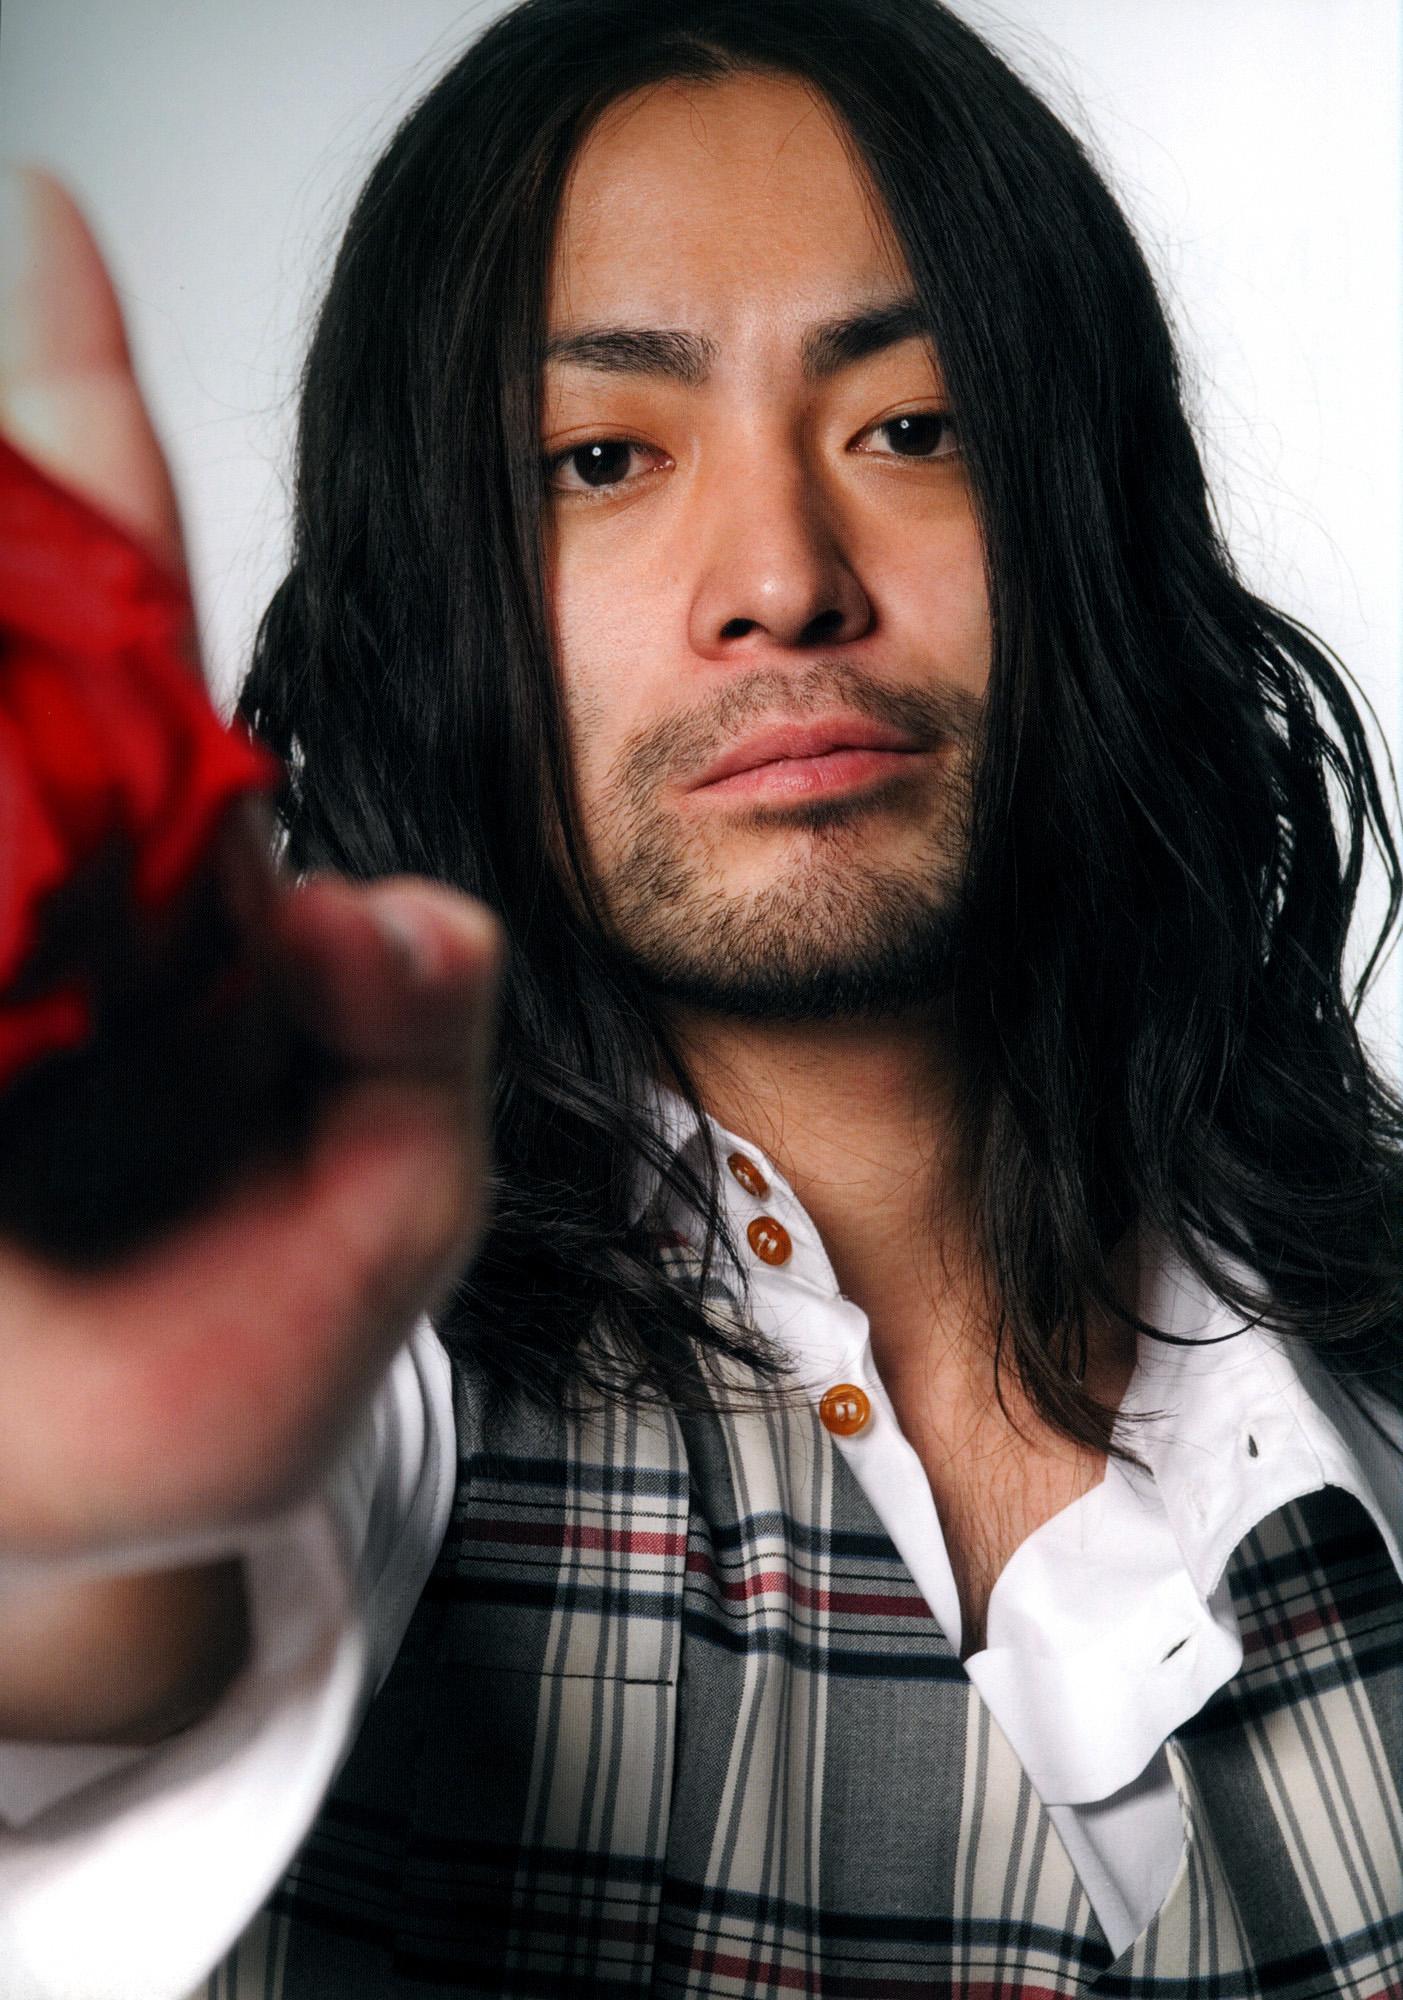 yamada takayuki deserves more love